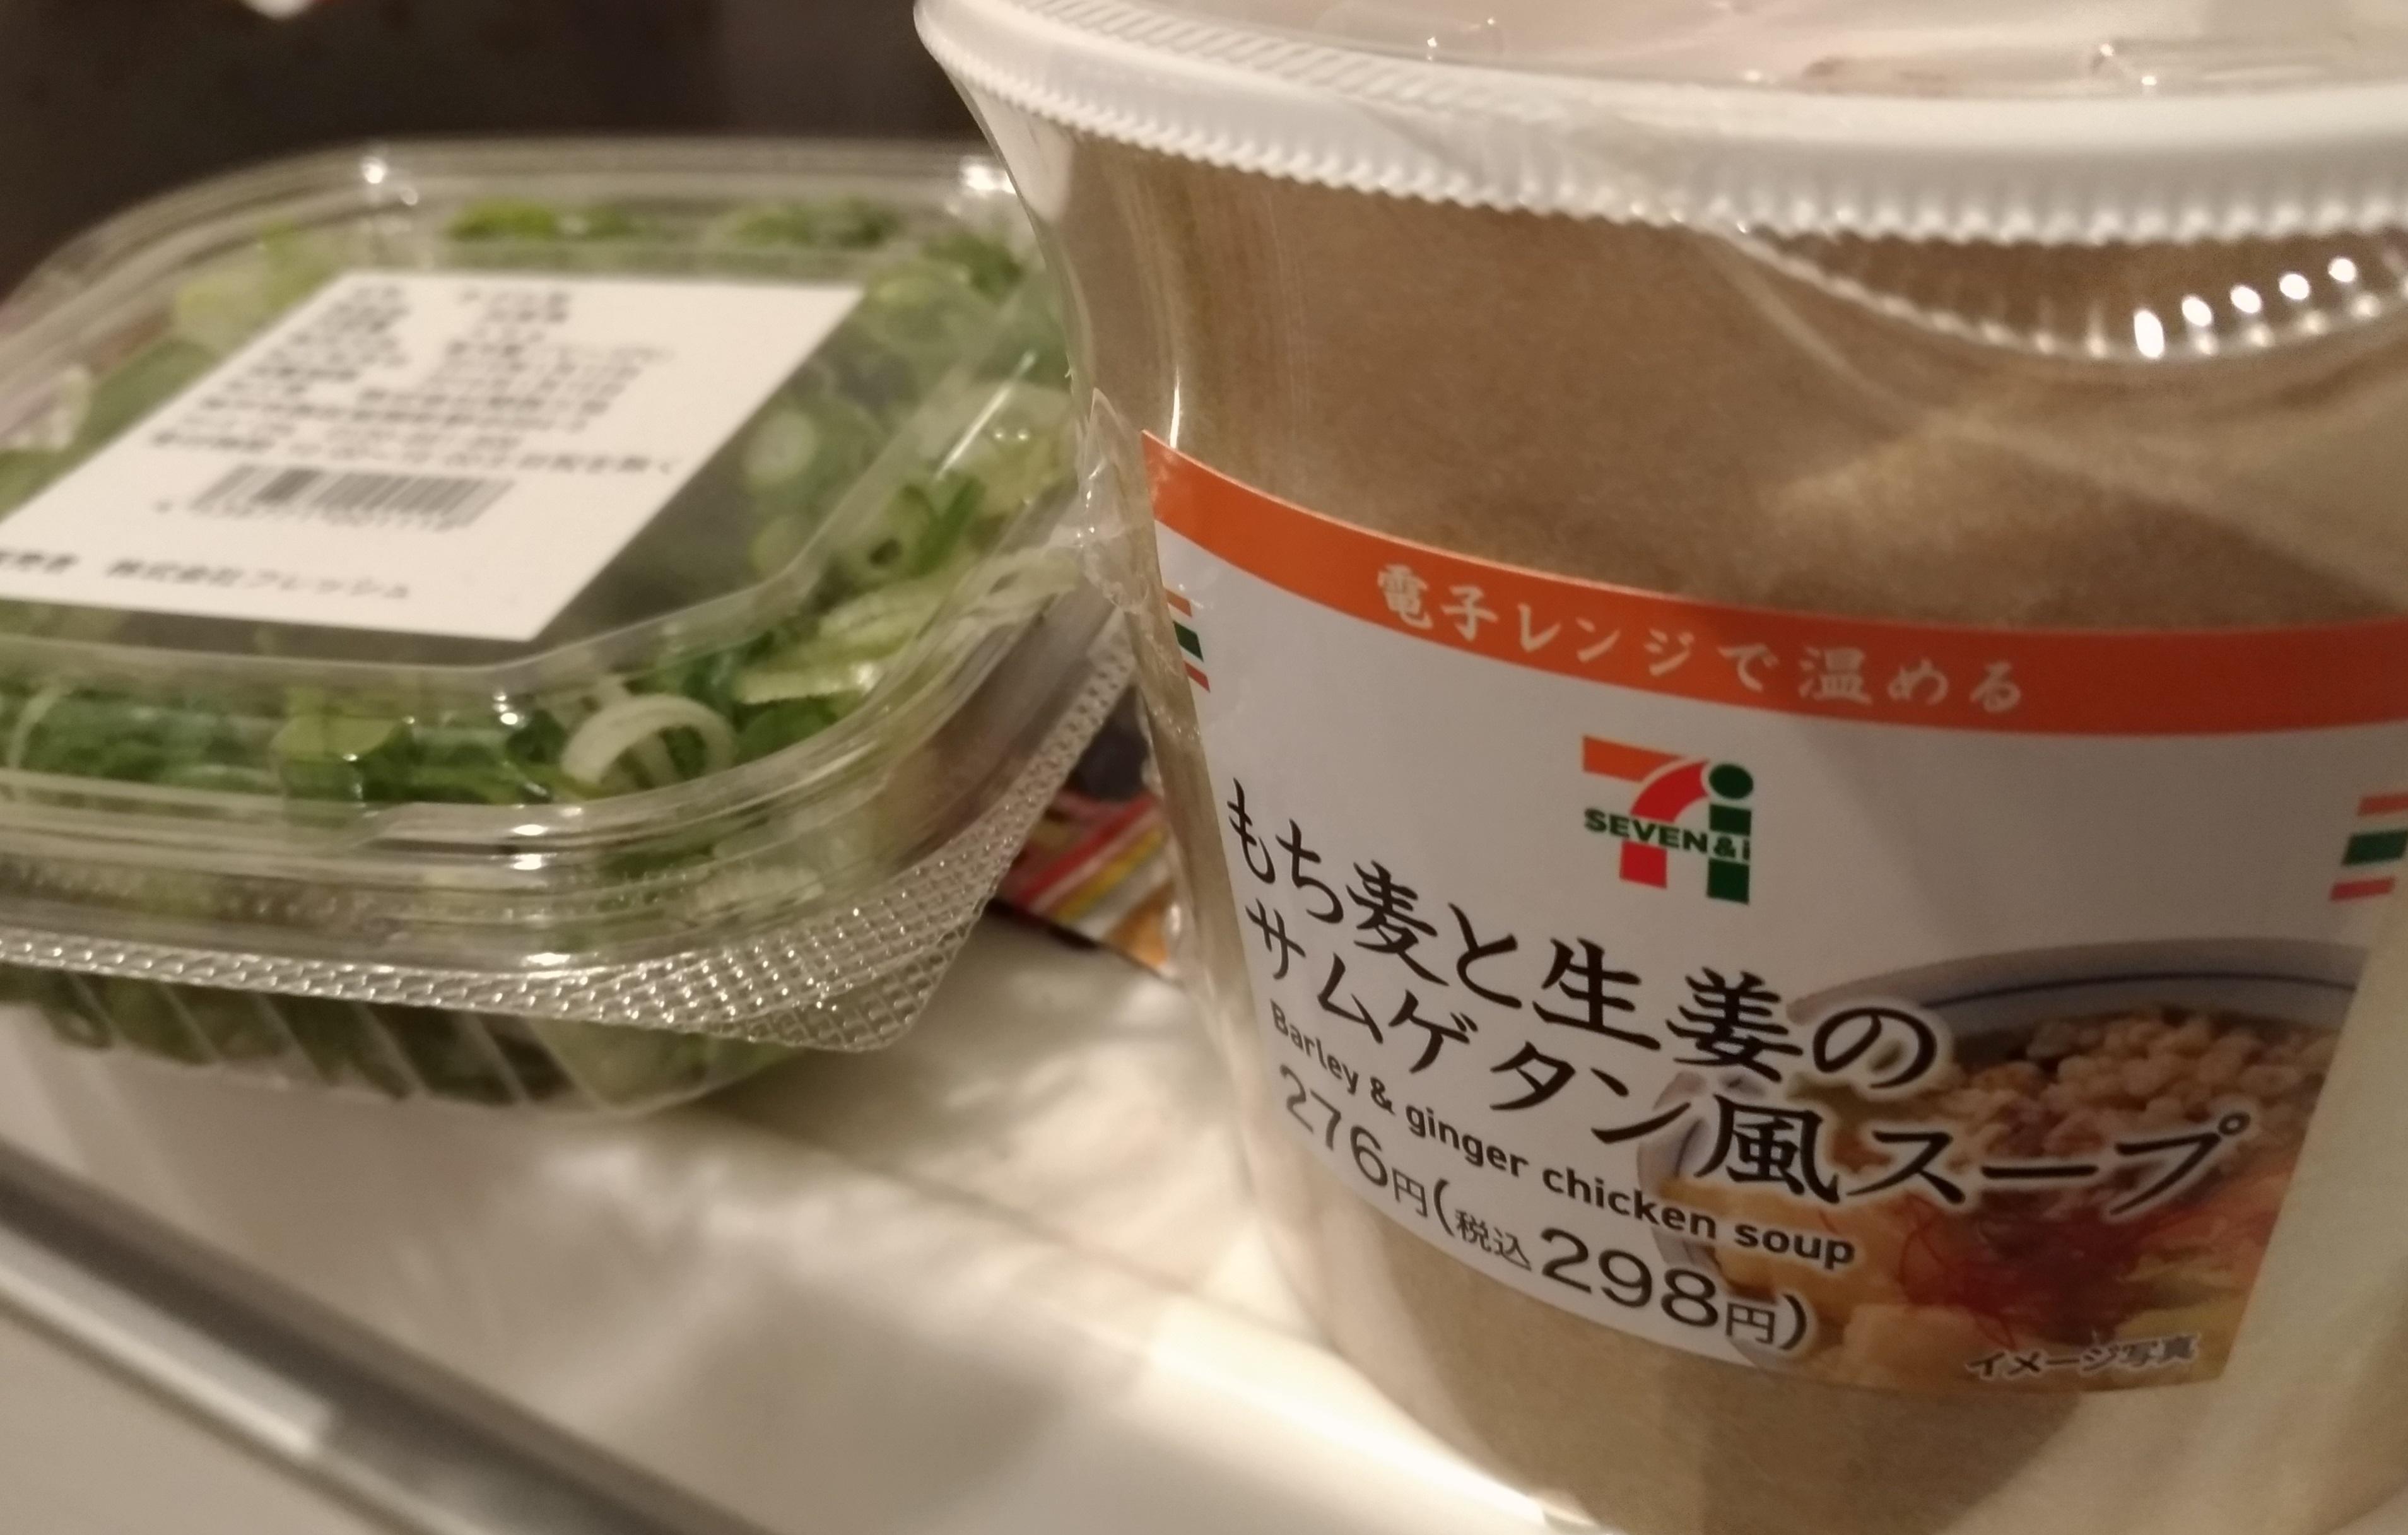 osaka_convenience_store_healthy.jpg